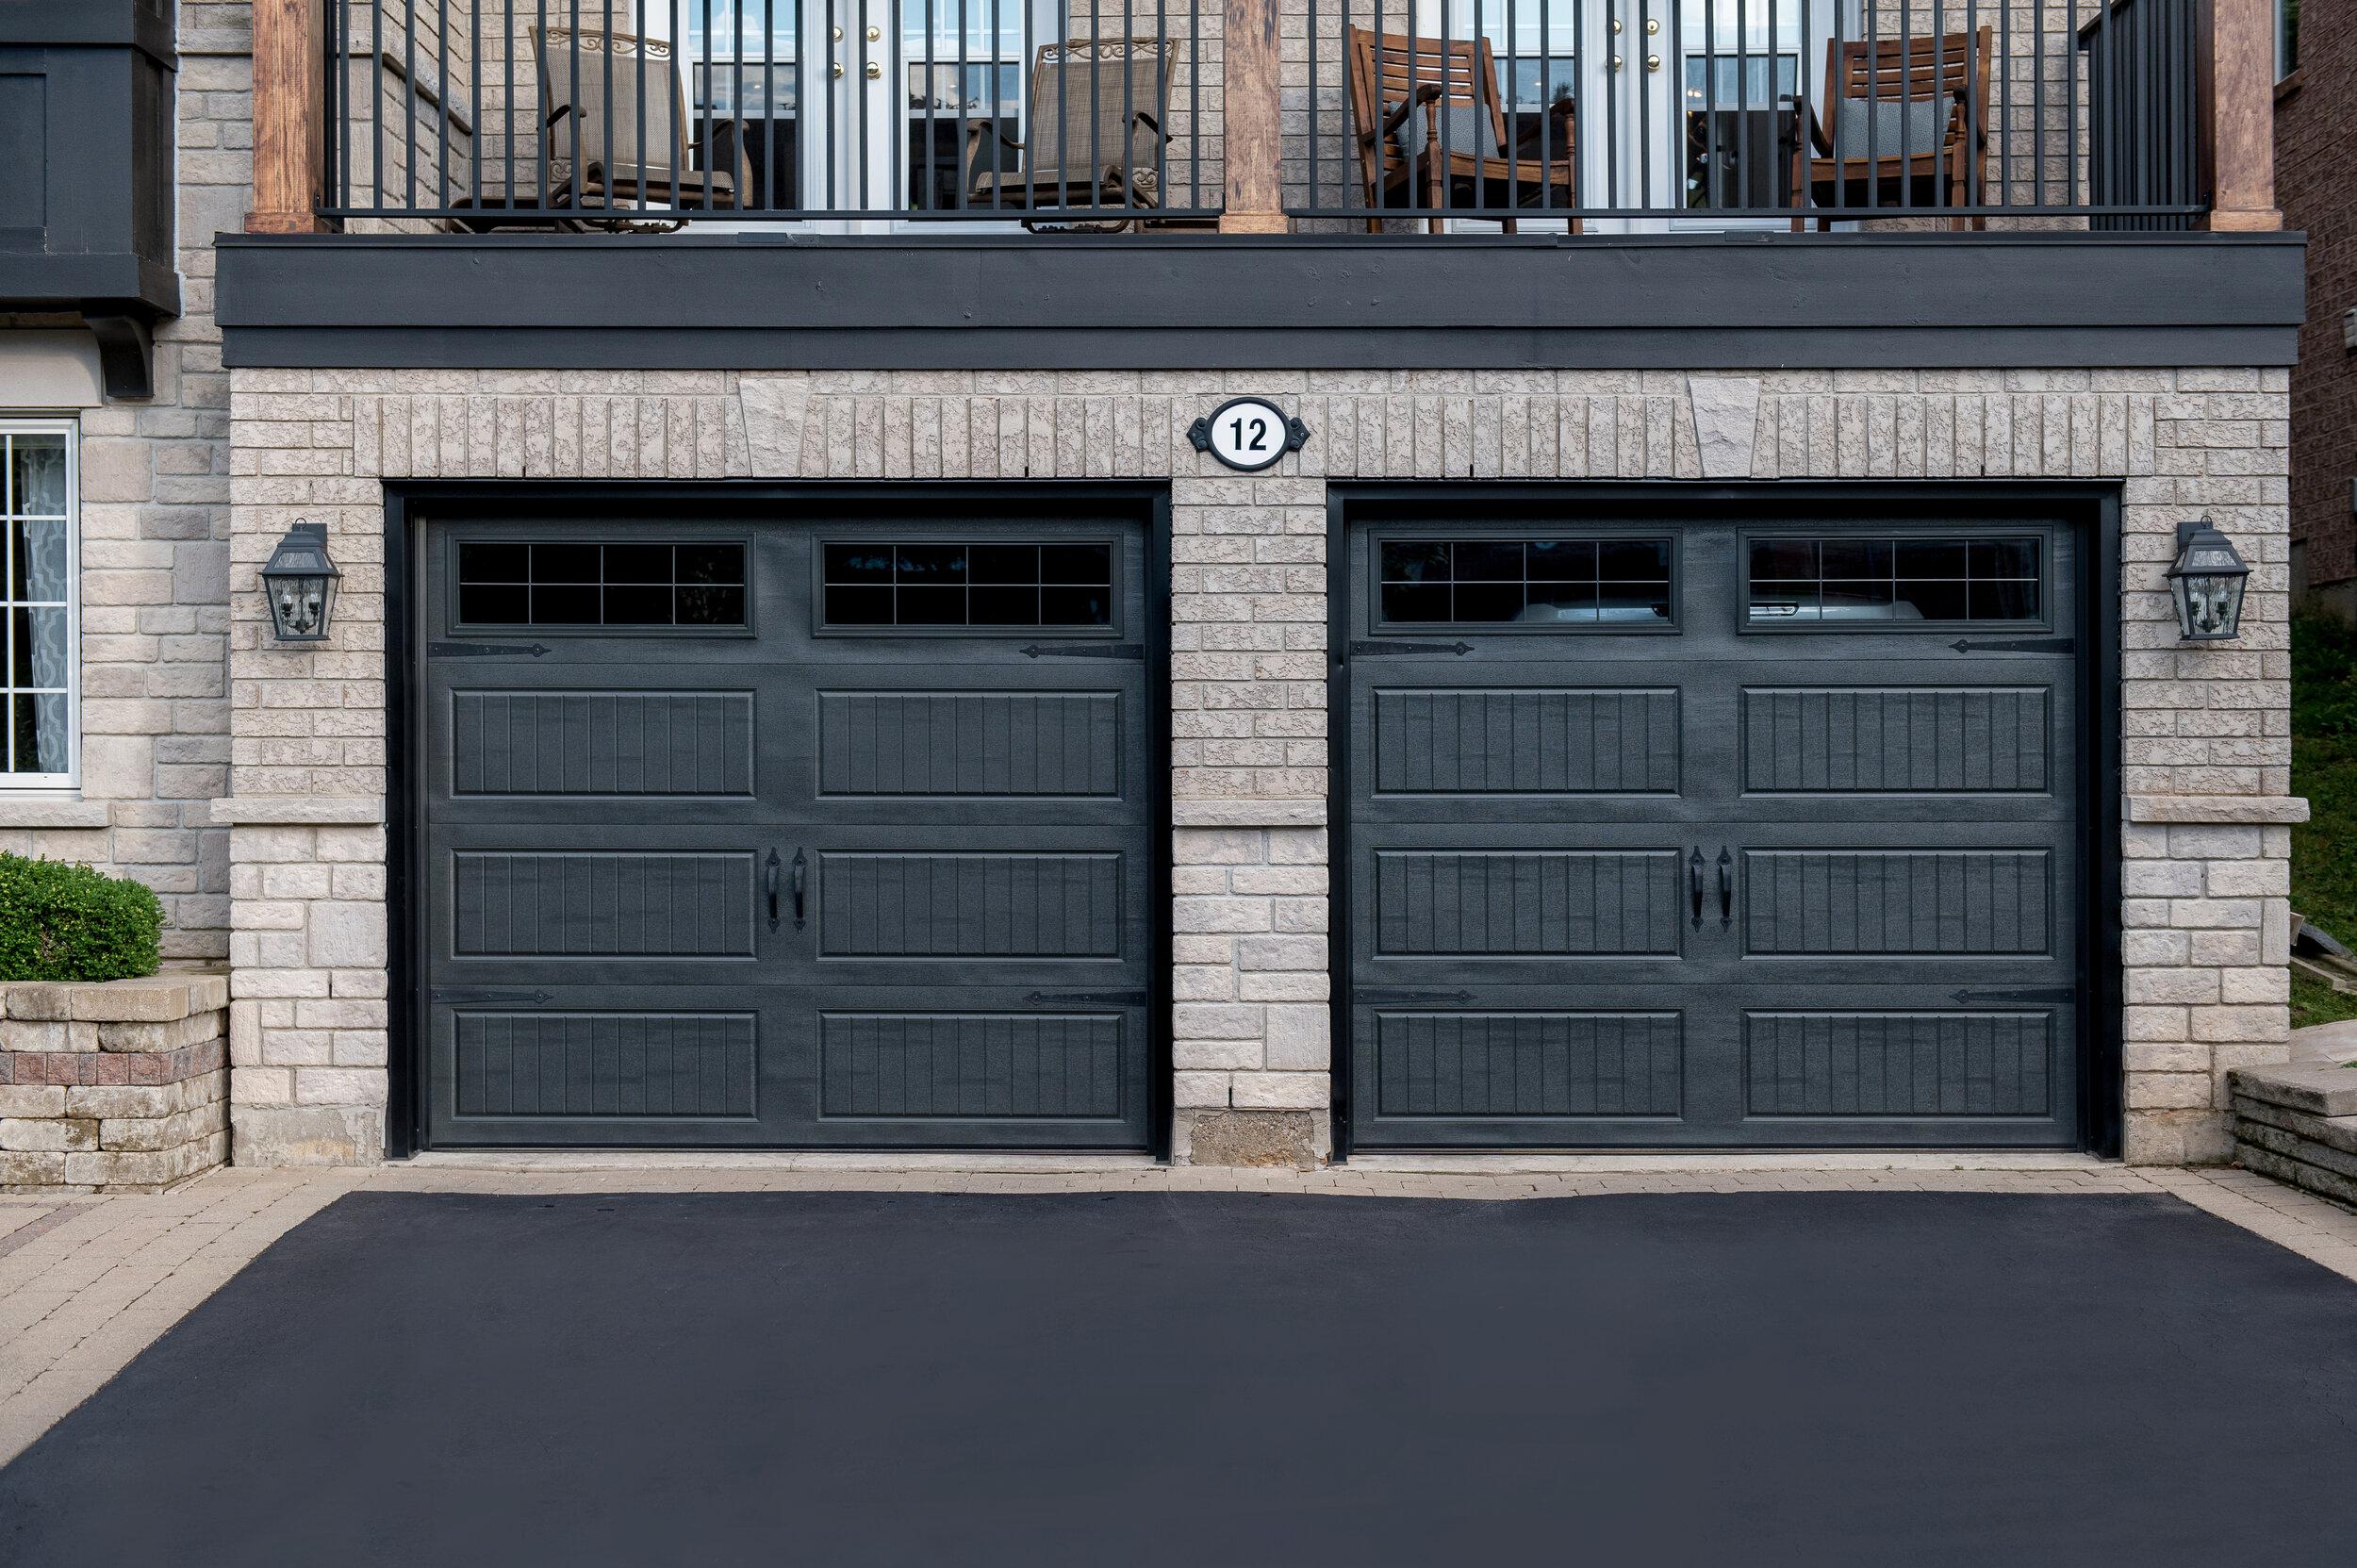 12 Arborglen Drive - Exterior  (22).JPG